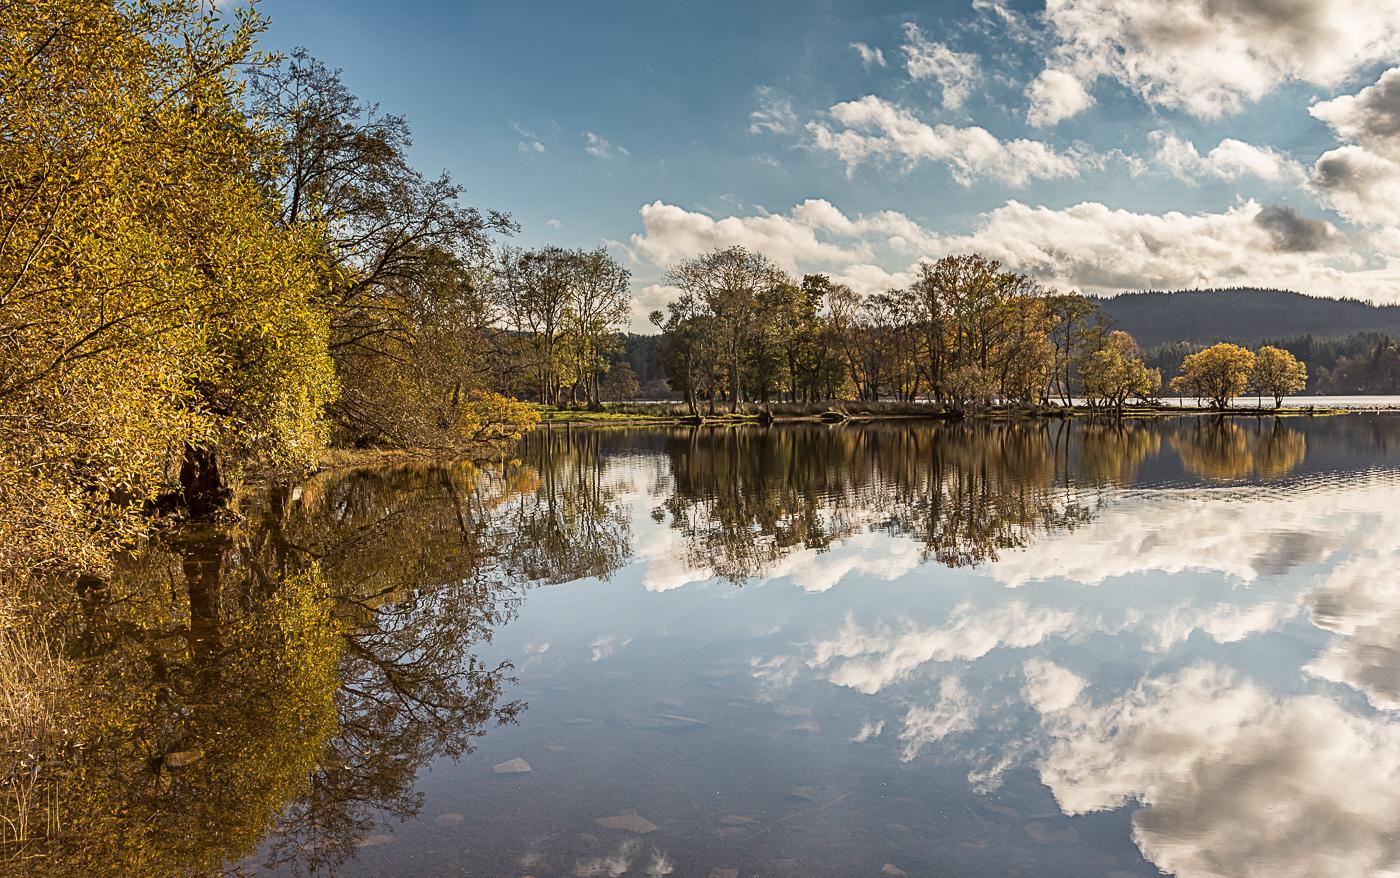 Loch Ard reflections